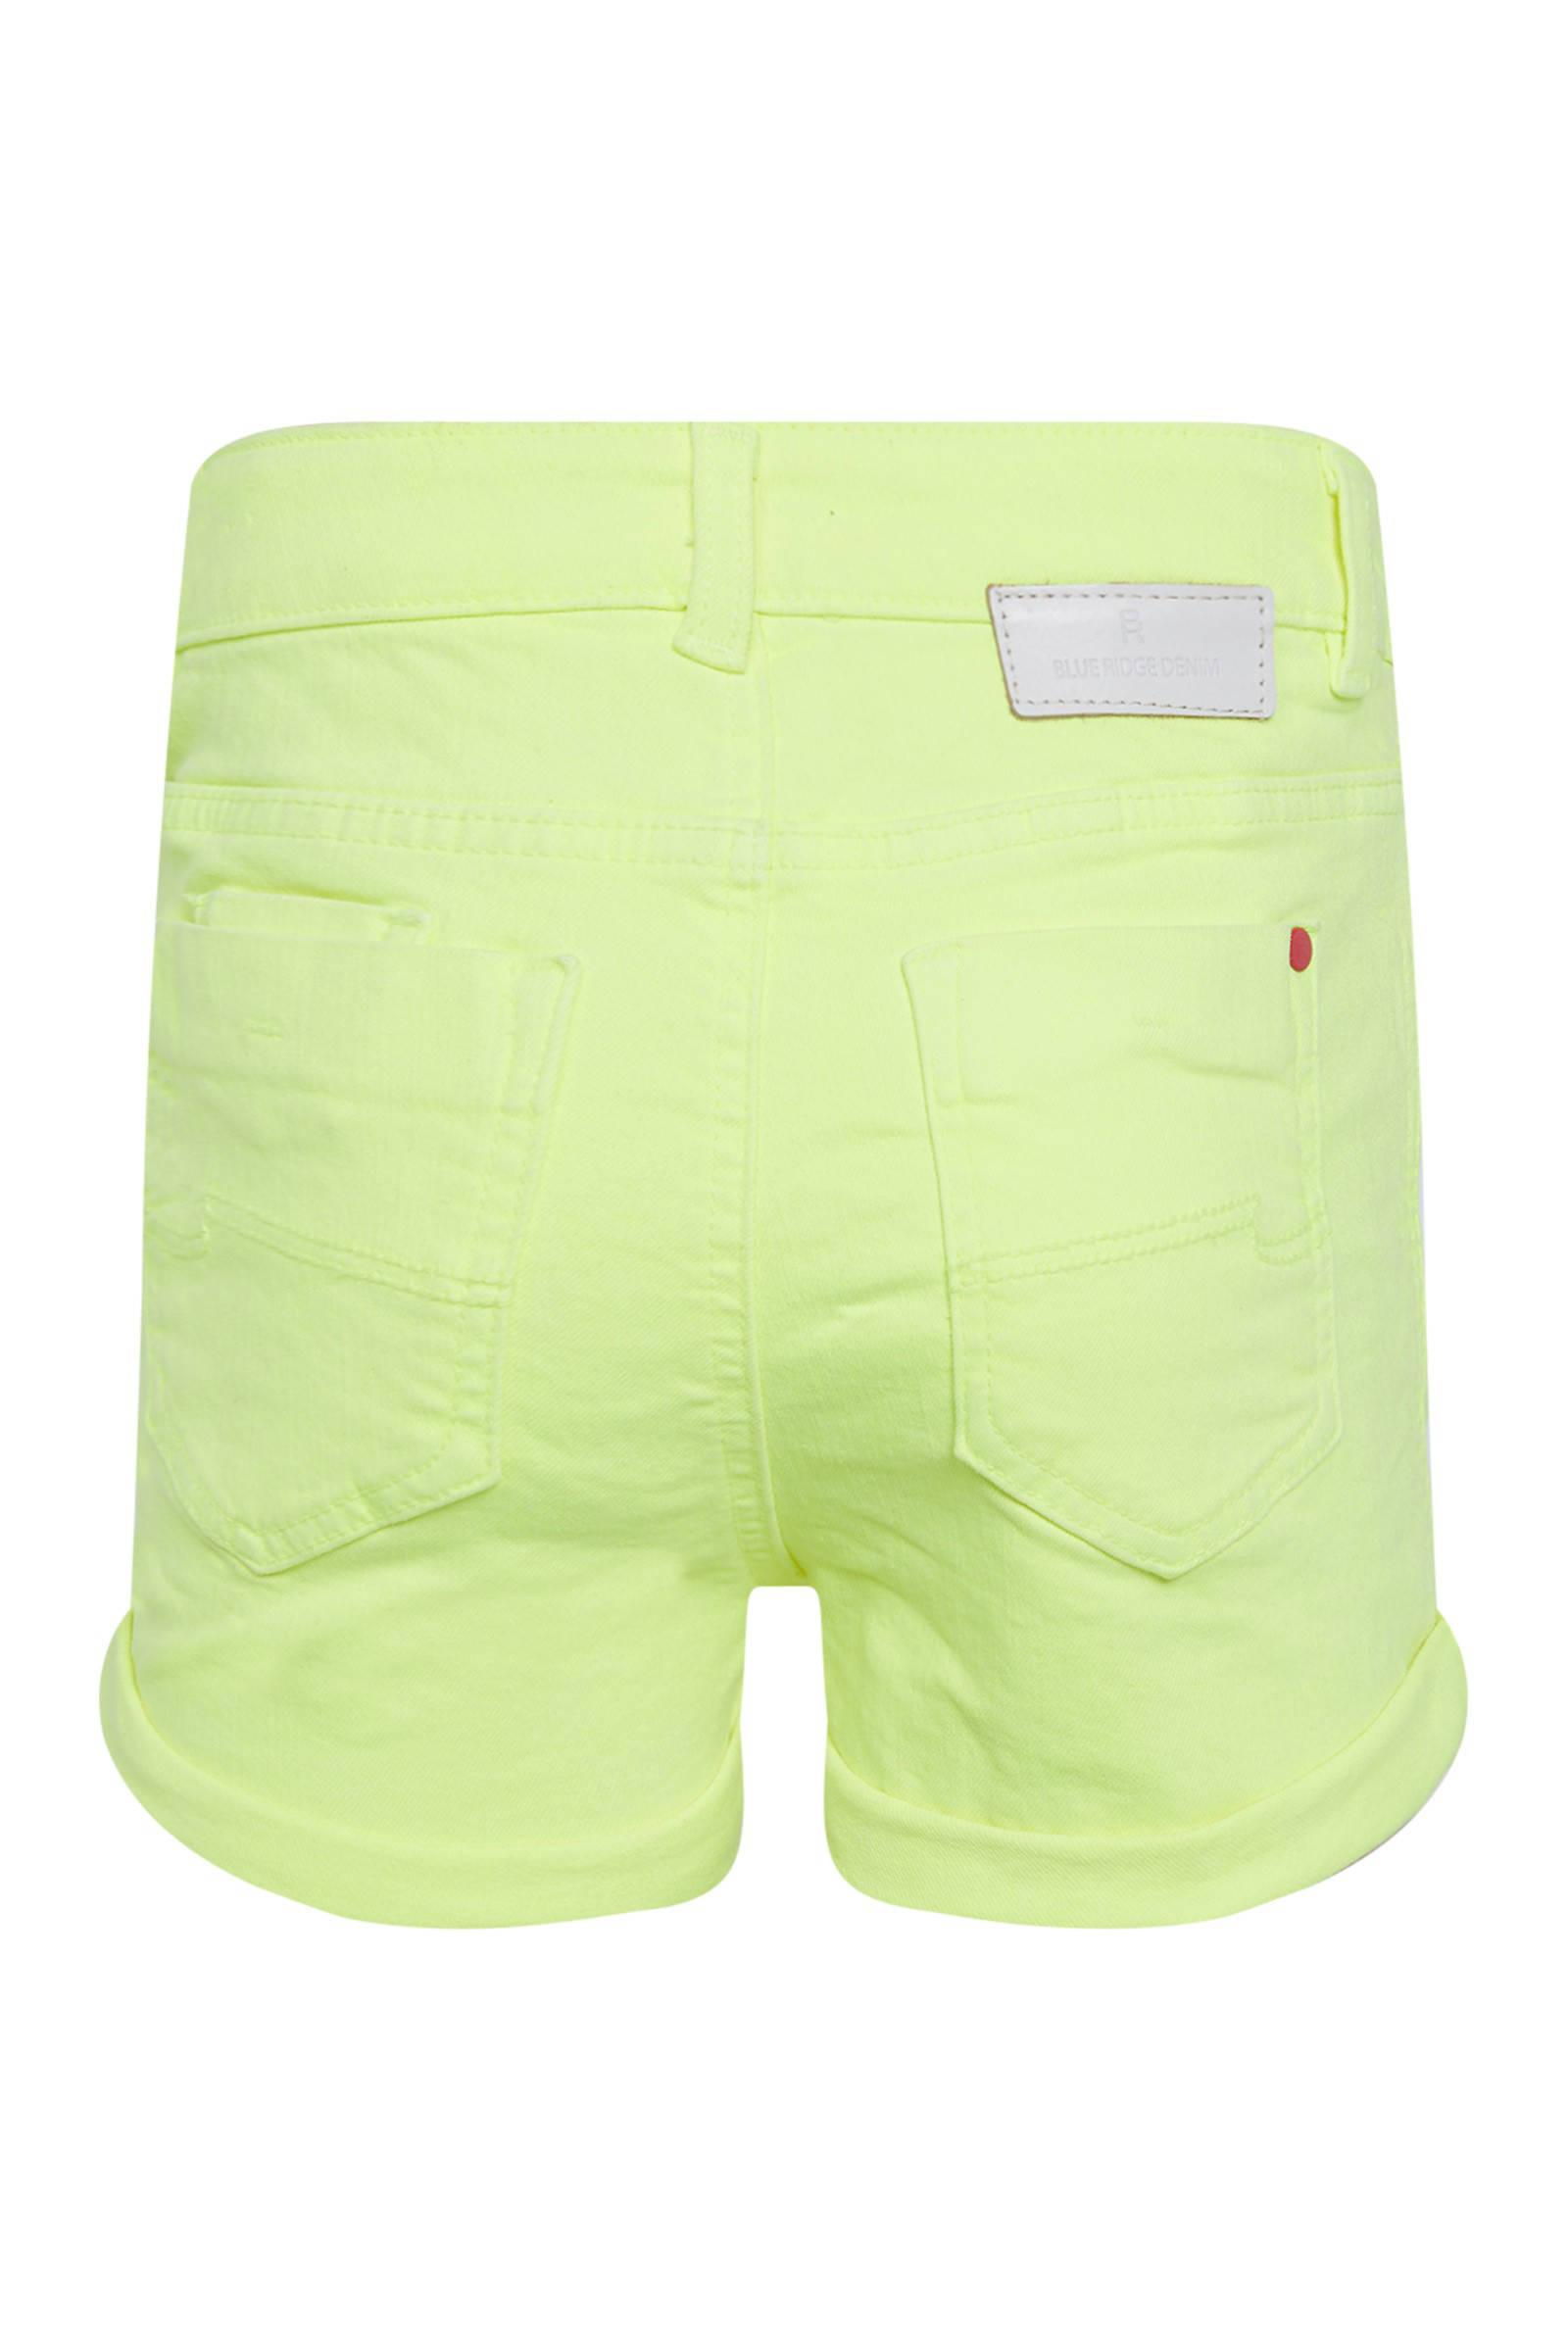 WE Fashion Blue Ridge short neon geelwit   wehkamp